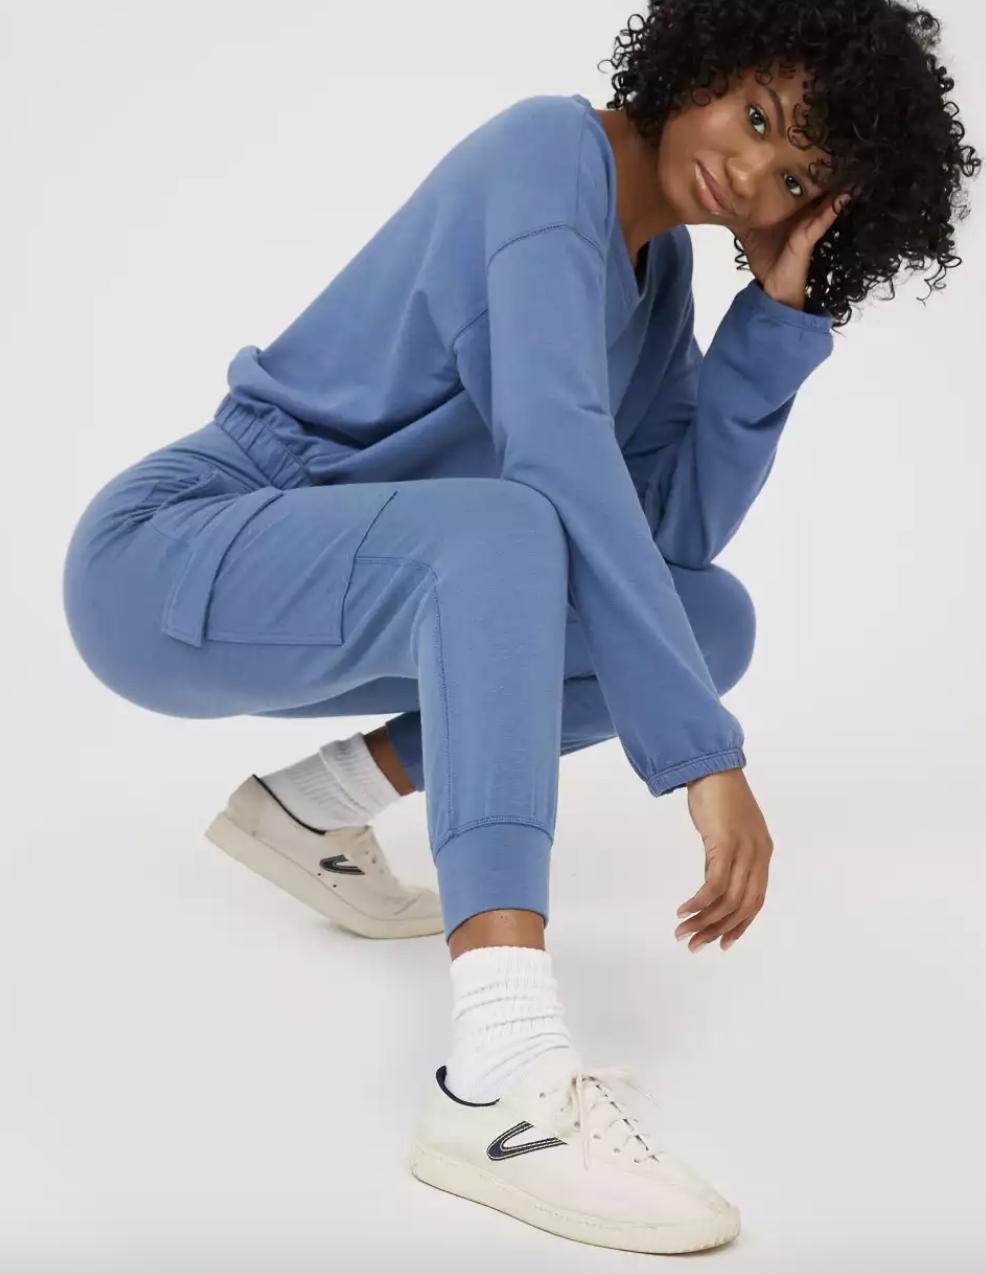 model wearing the blue cargo pants